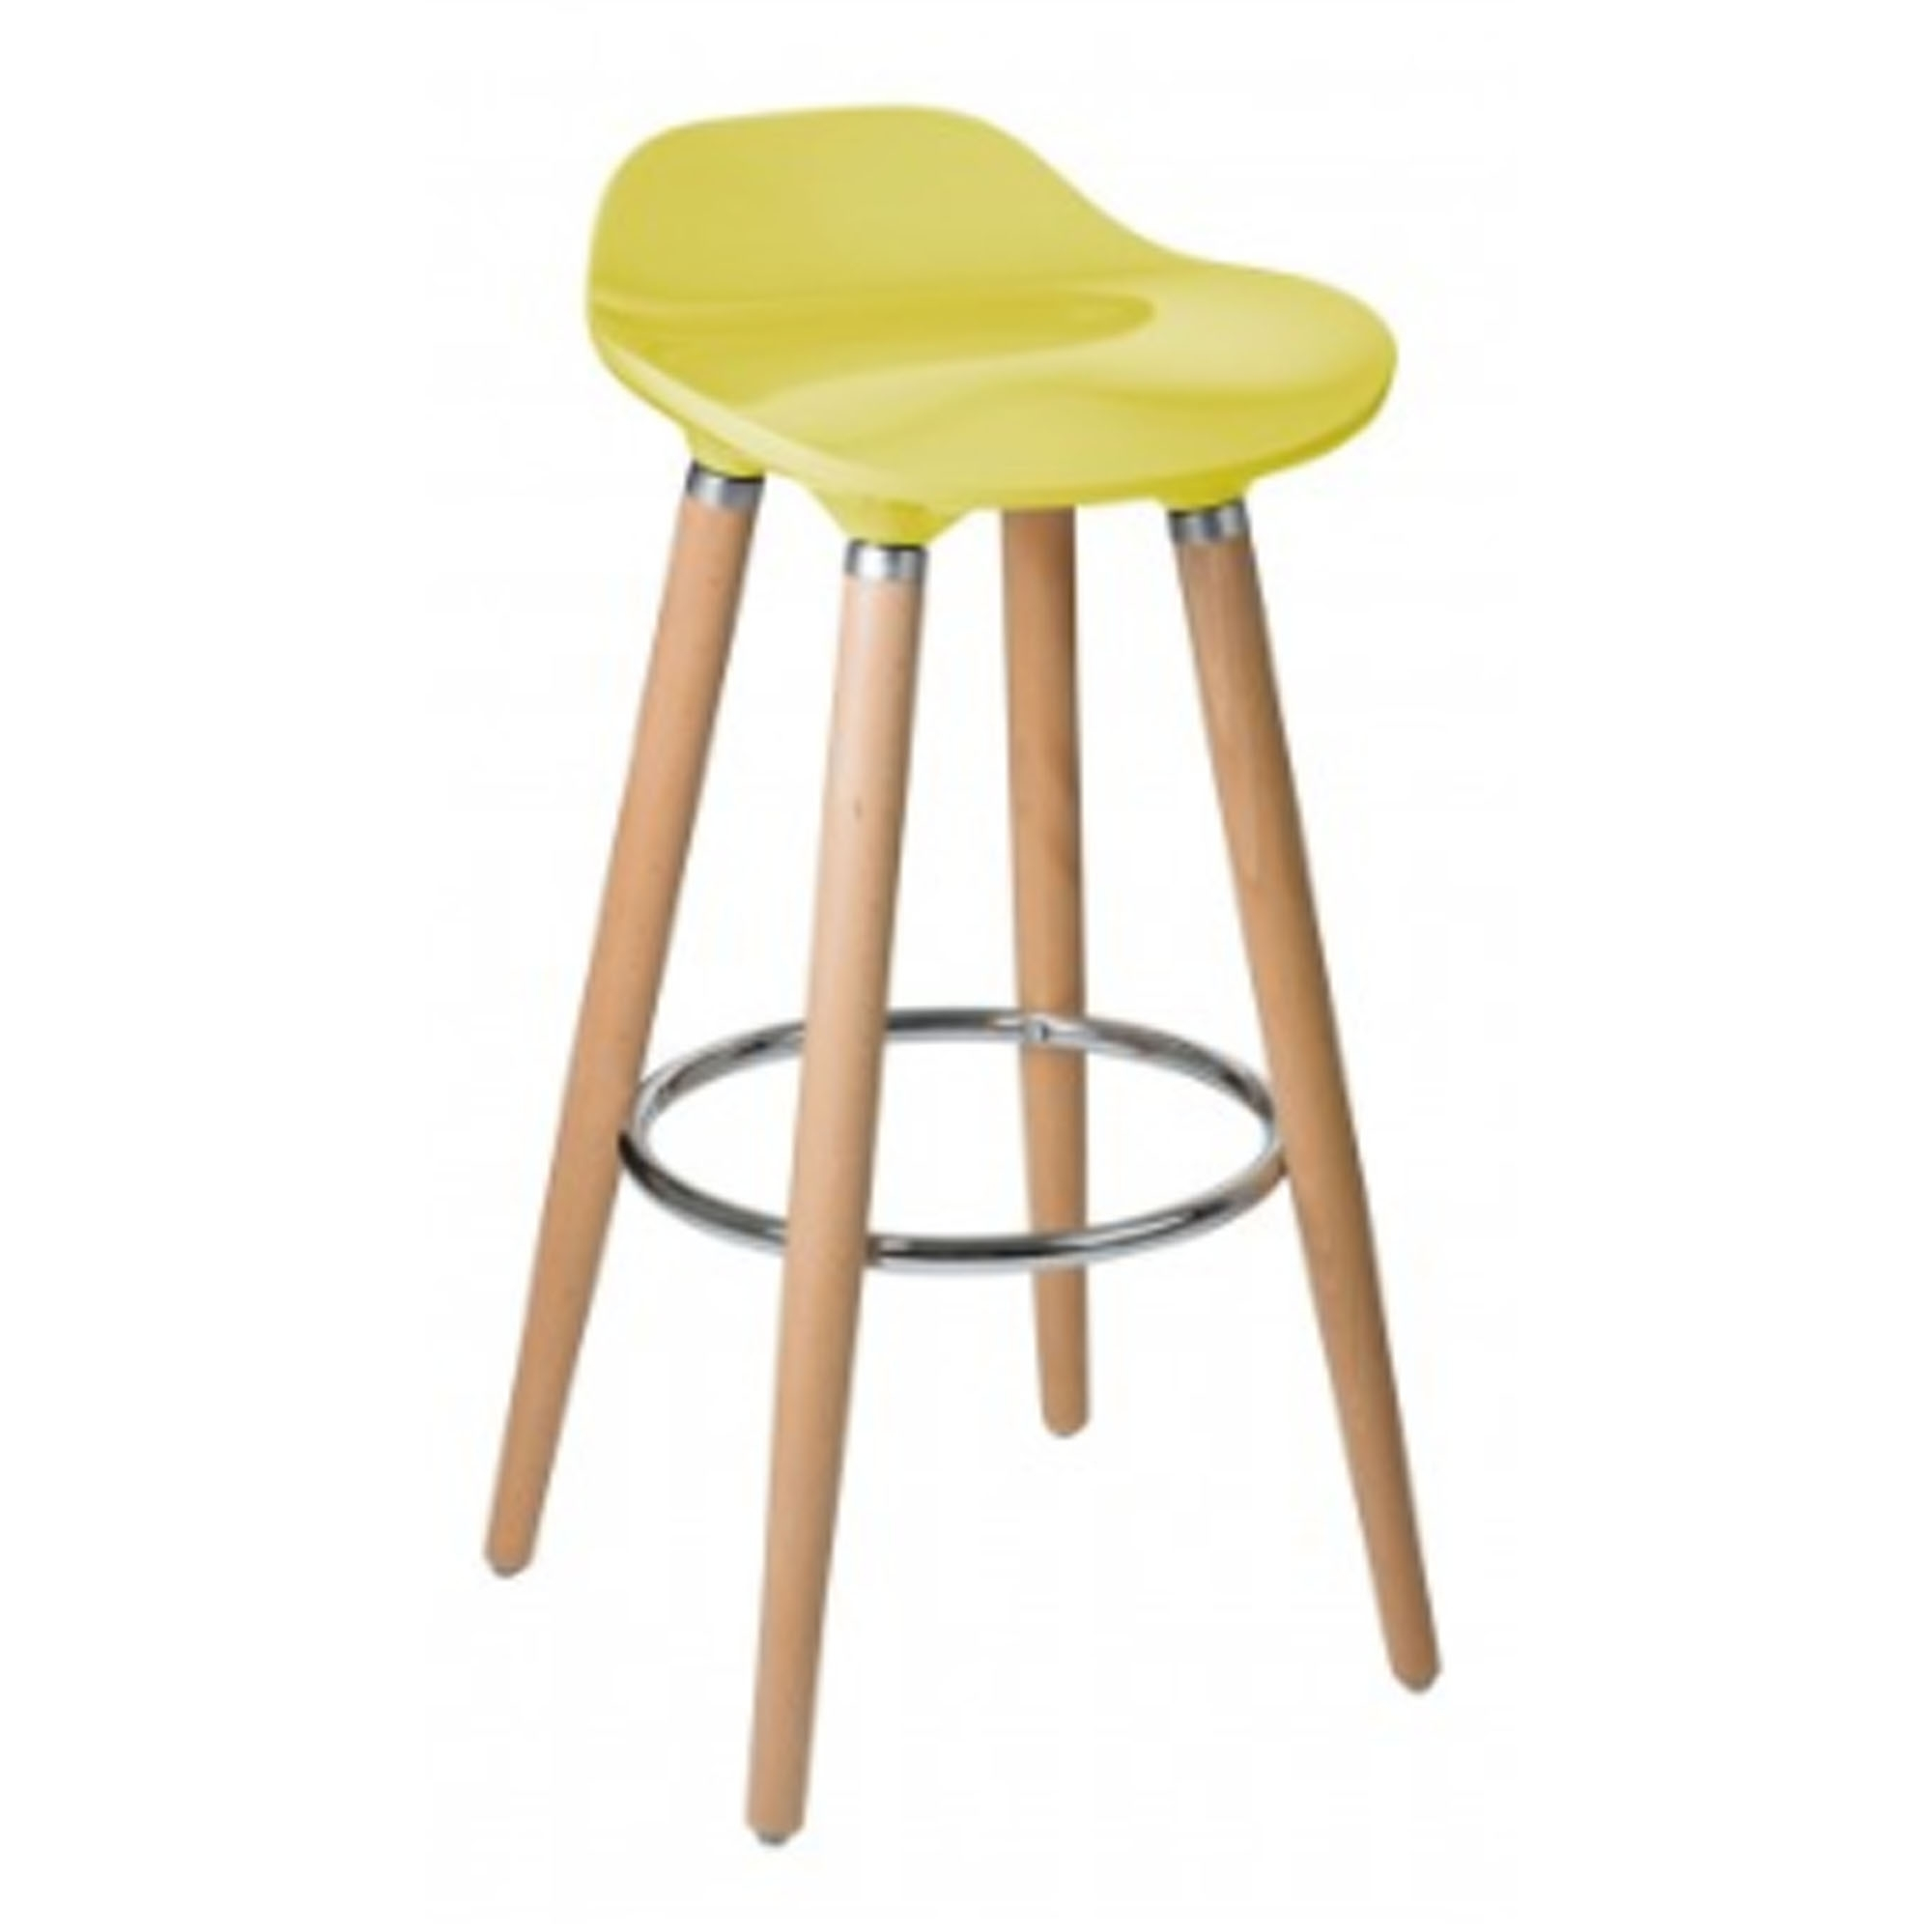 Yellow breakfast bar stool